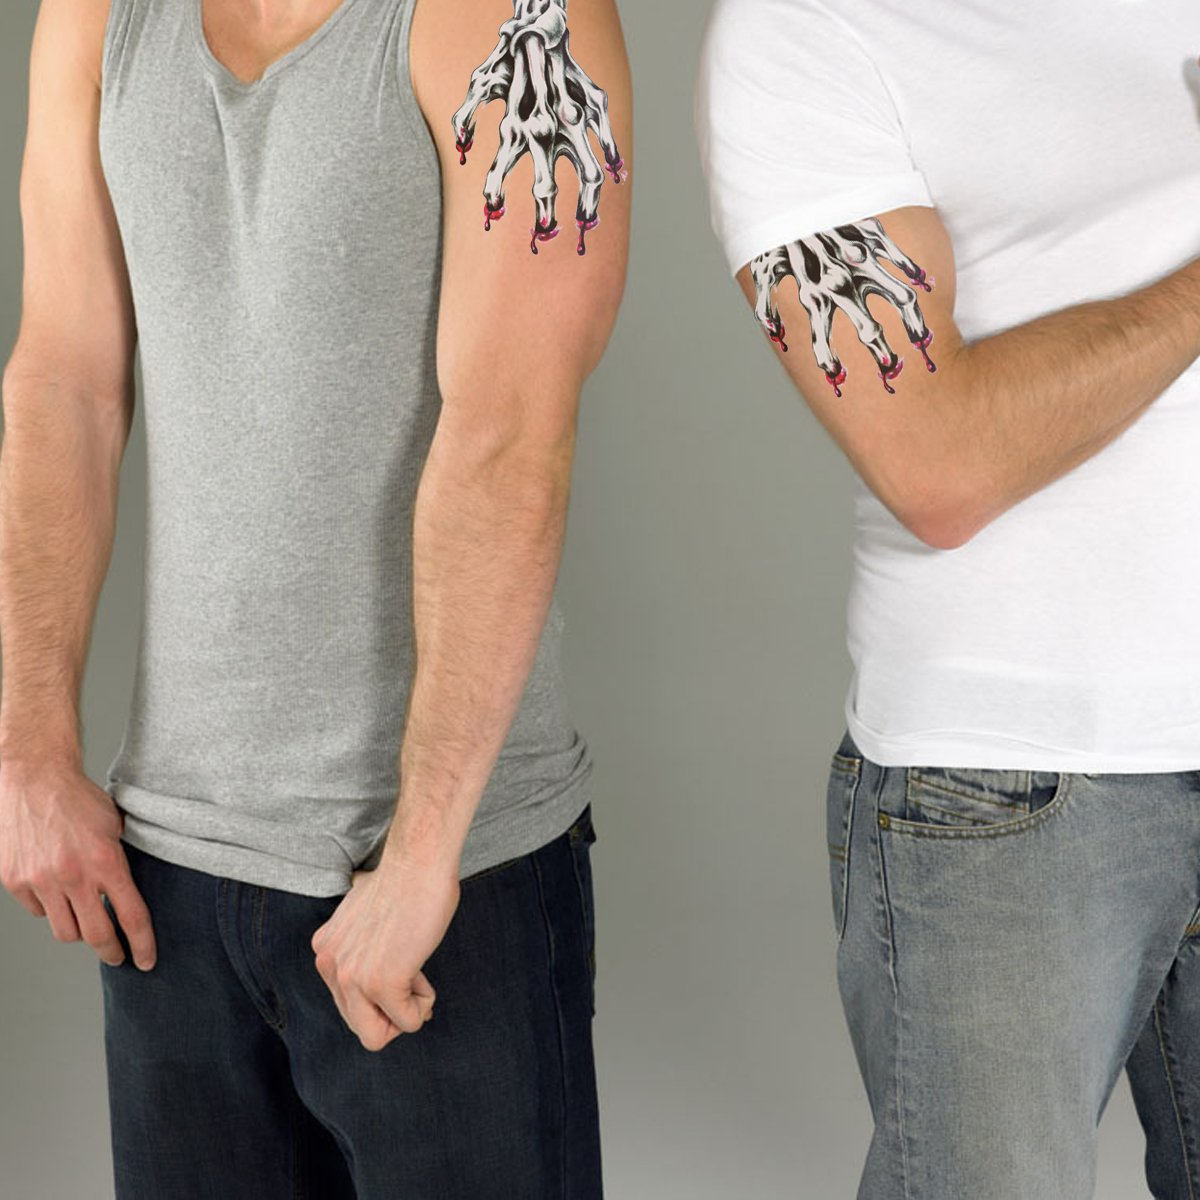 rosenice tatuaje Halloween tatuaje temporal tatuaje temporairement ...